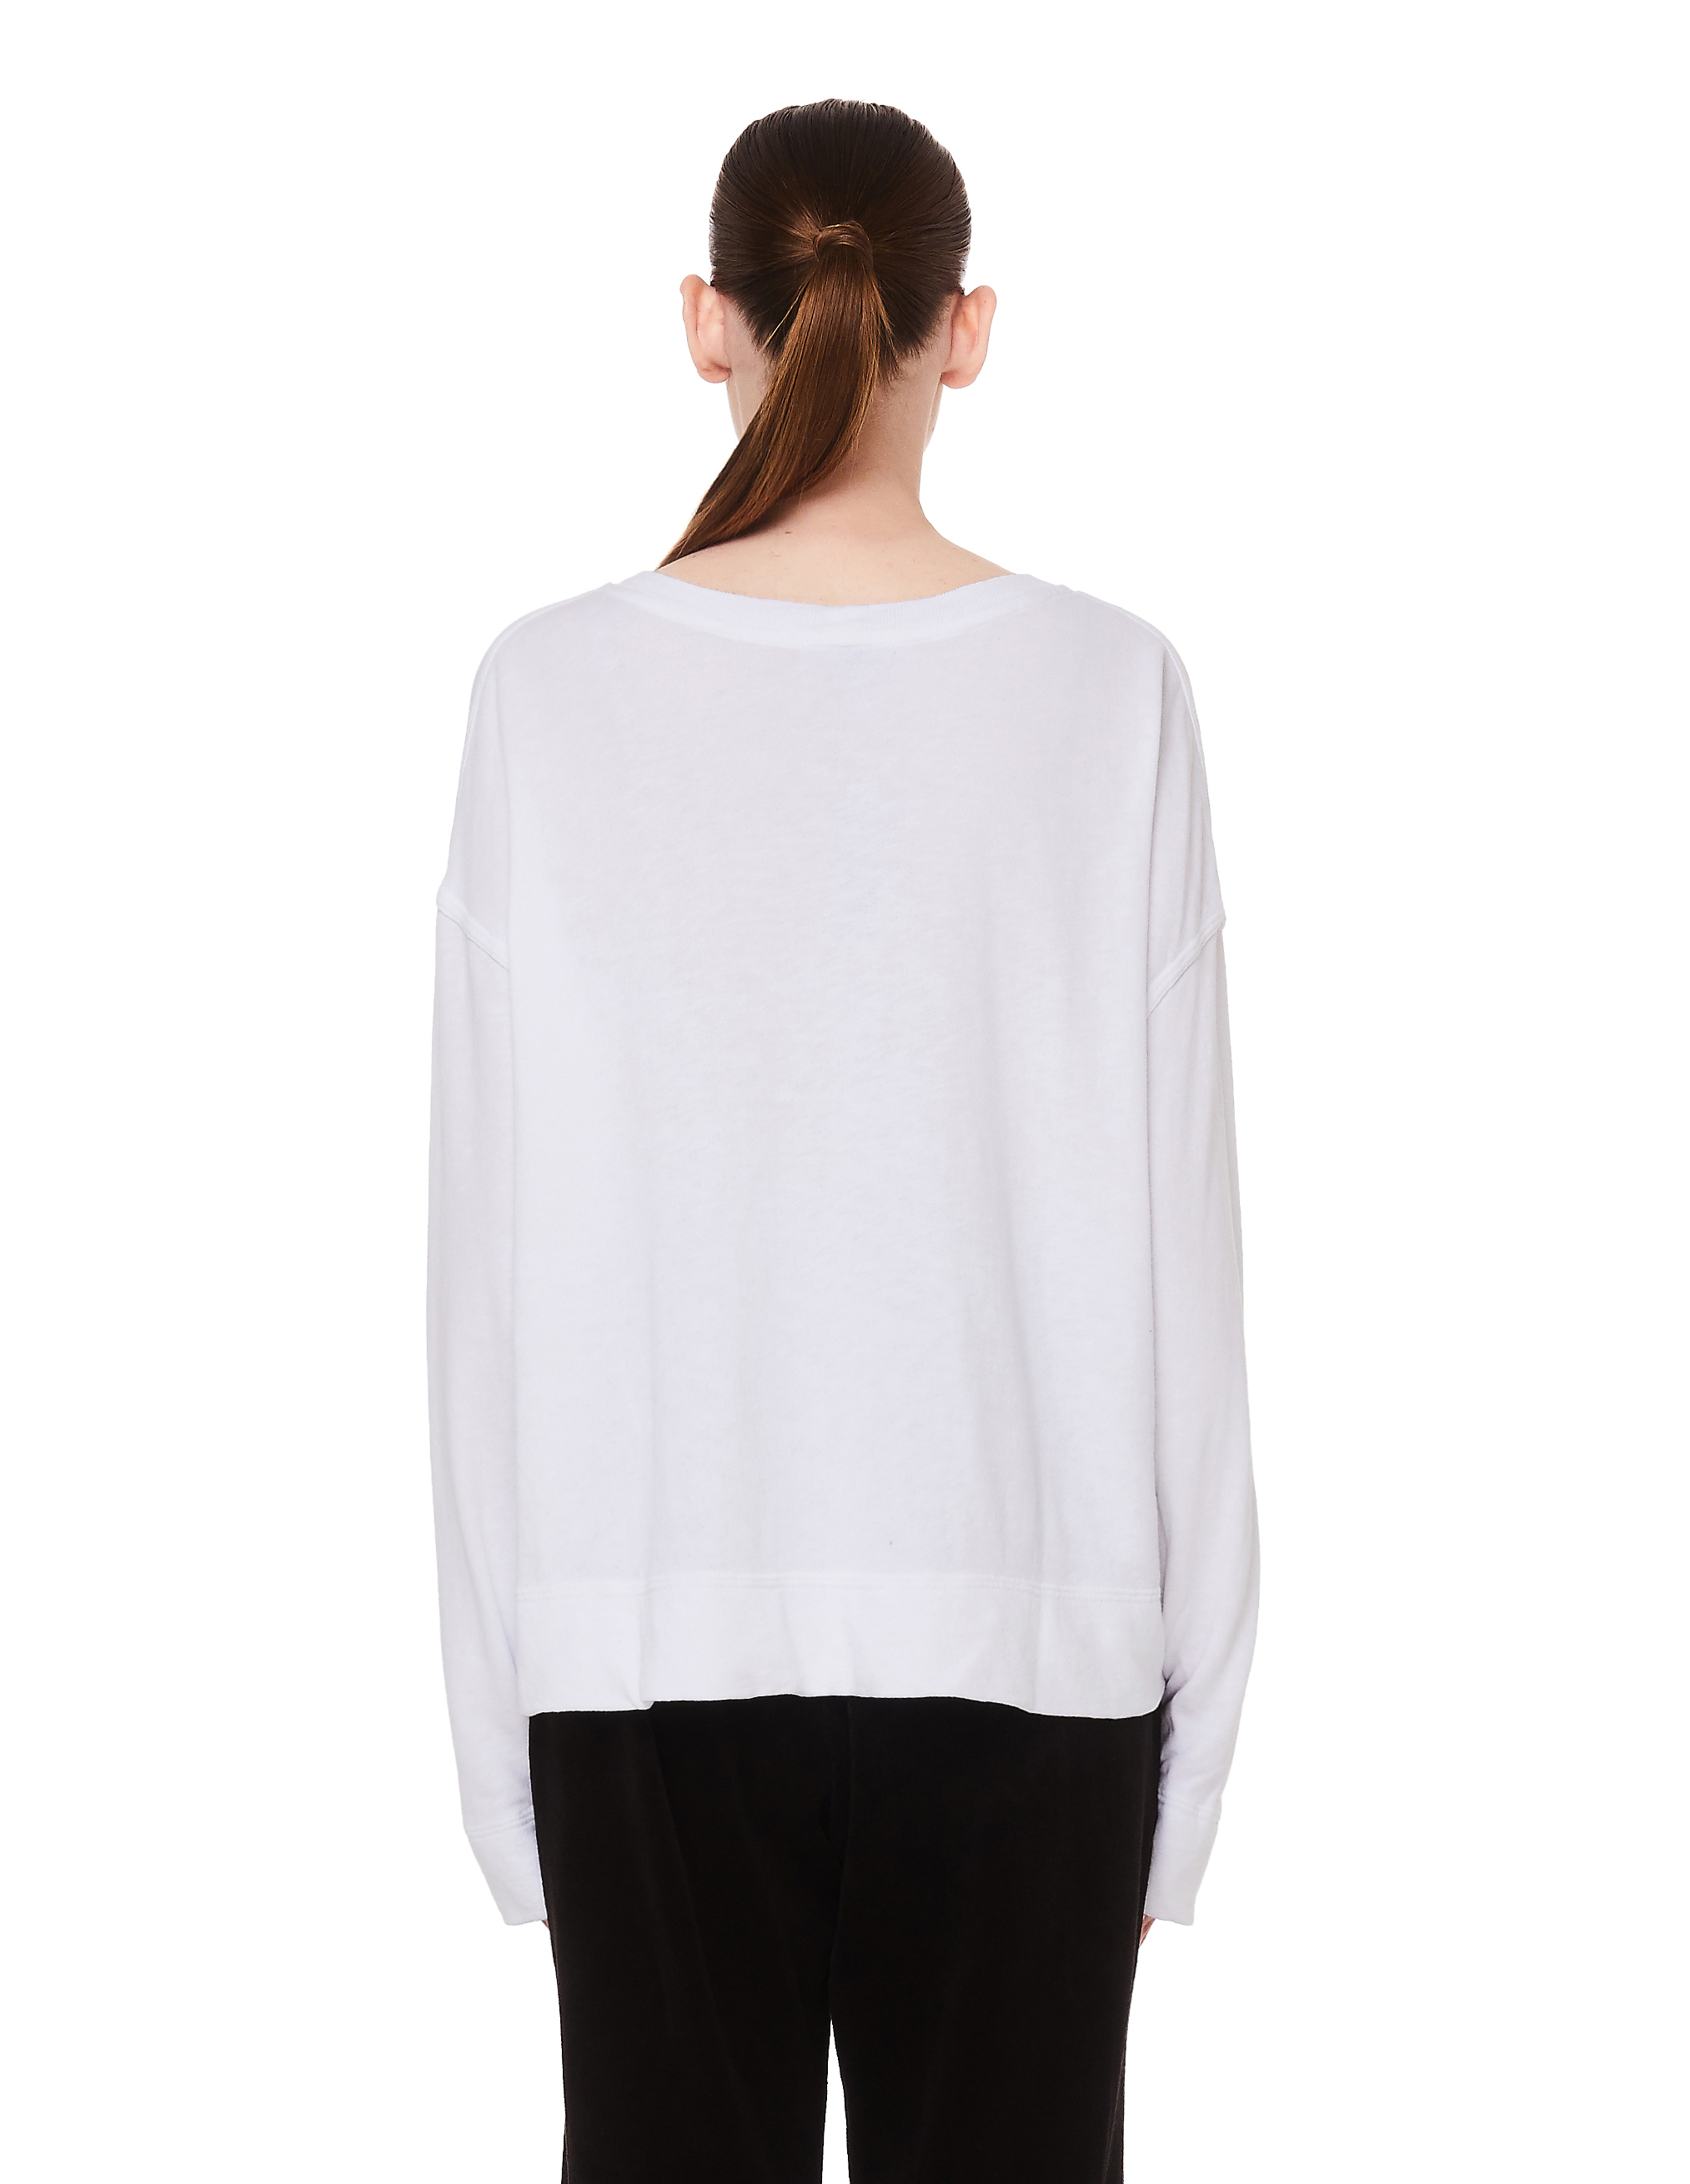 James Perse White Cotton Cropped Sweatshirt